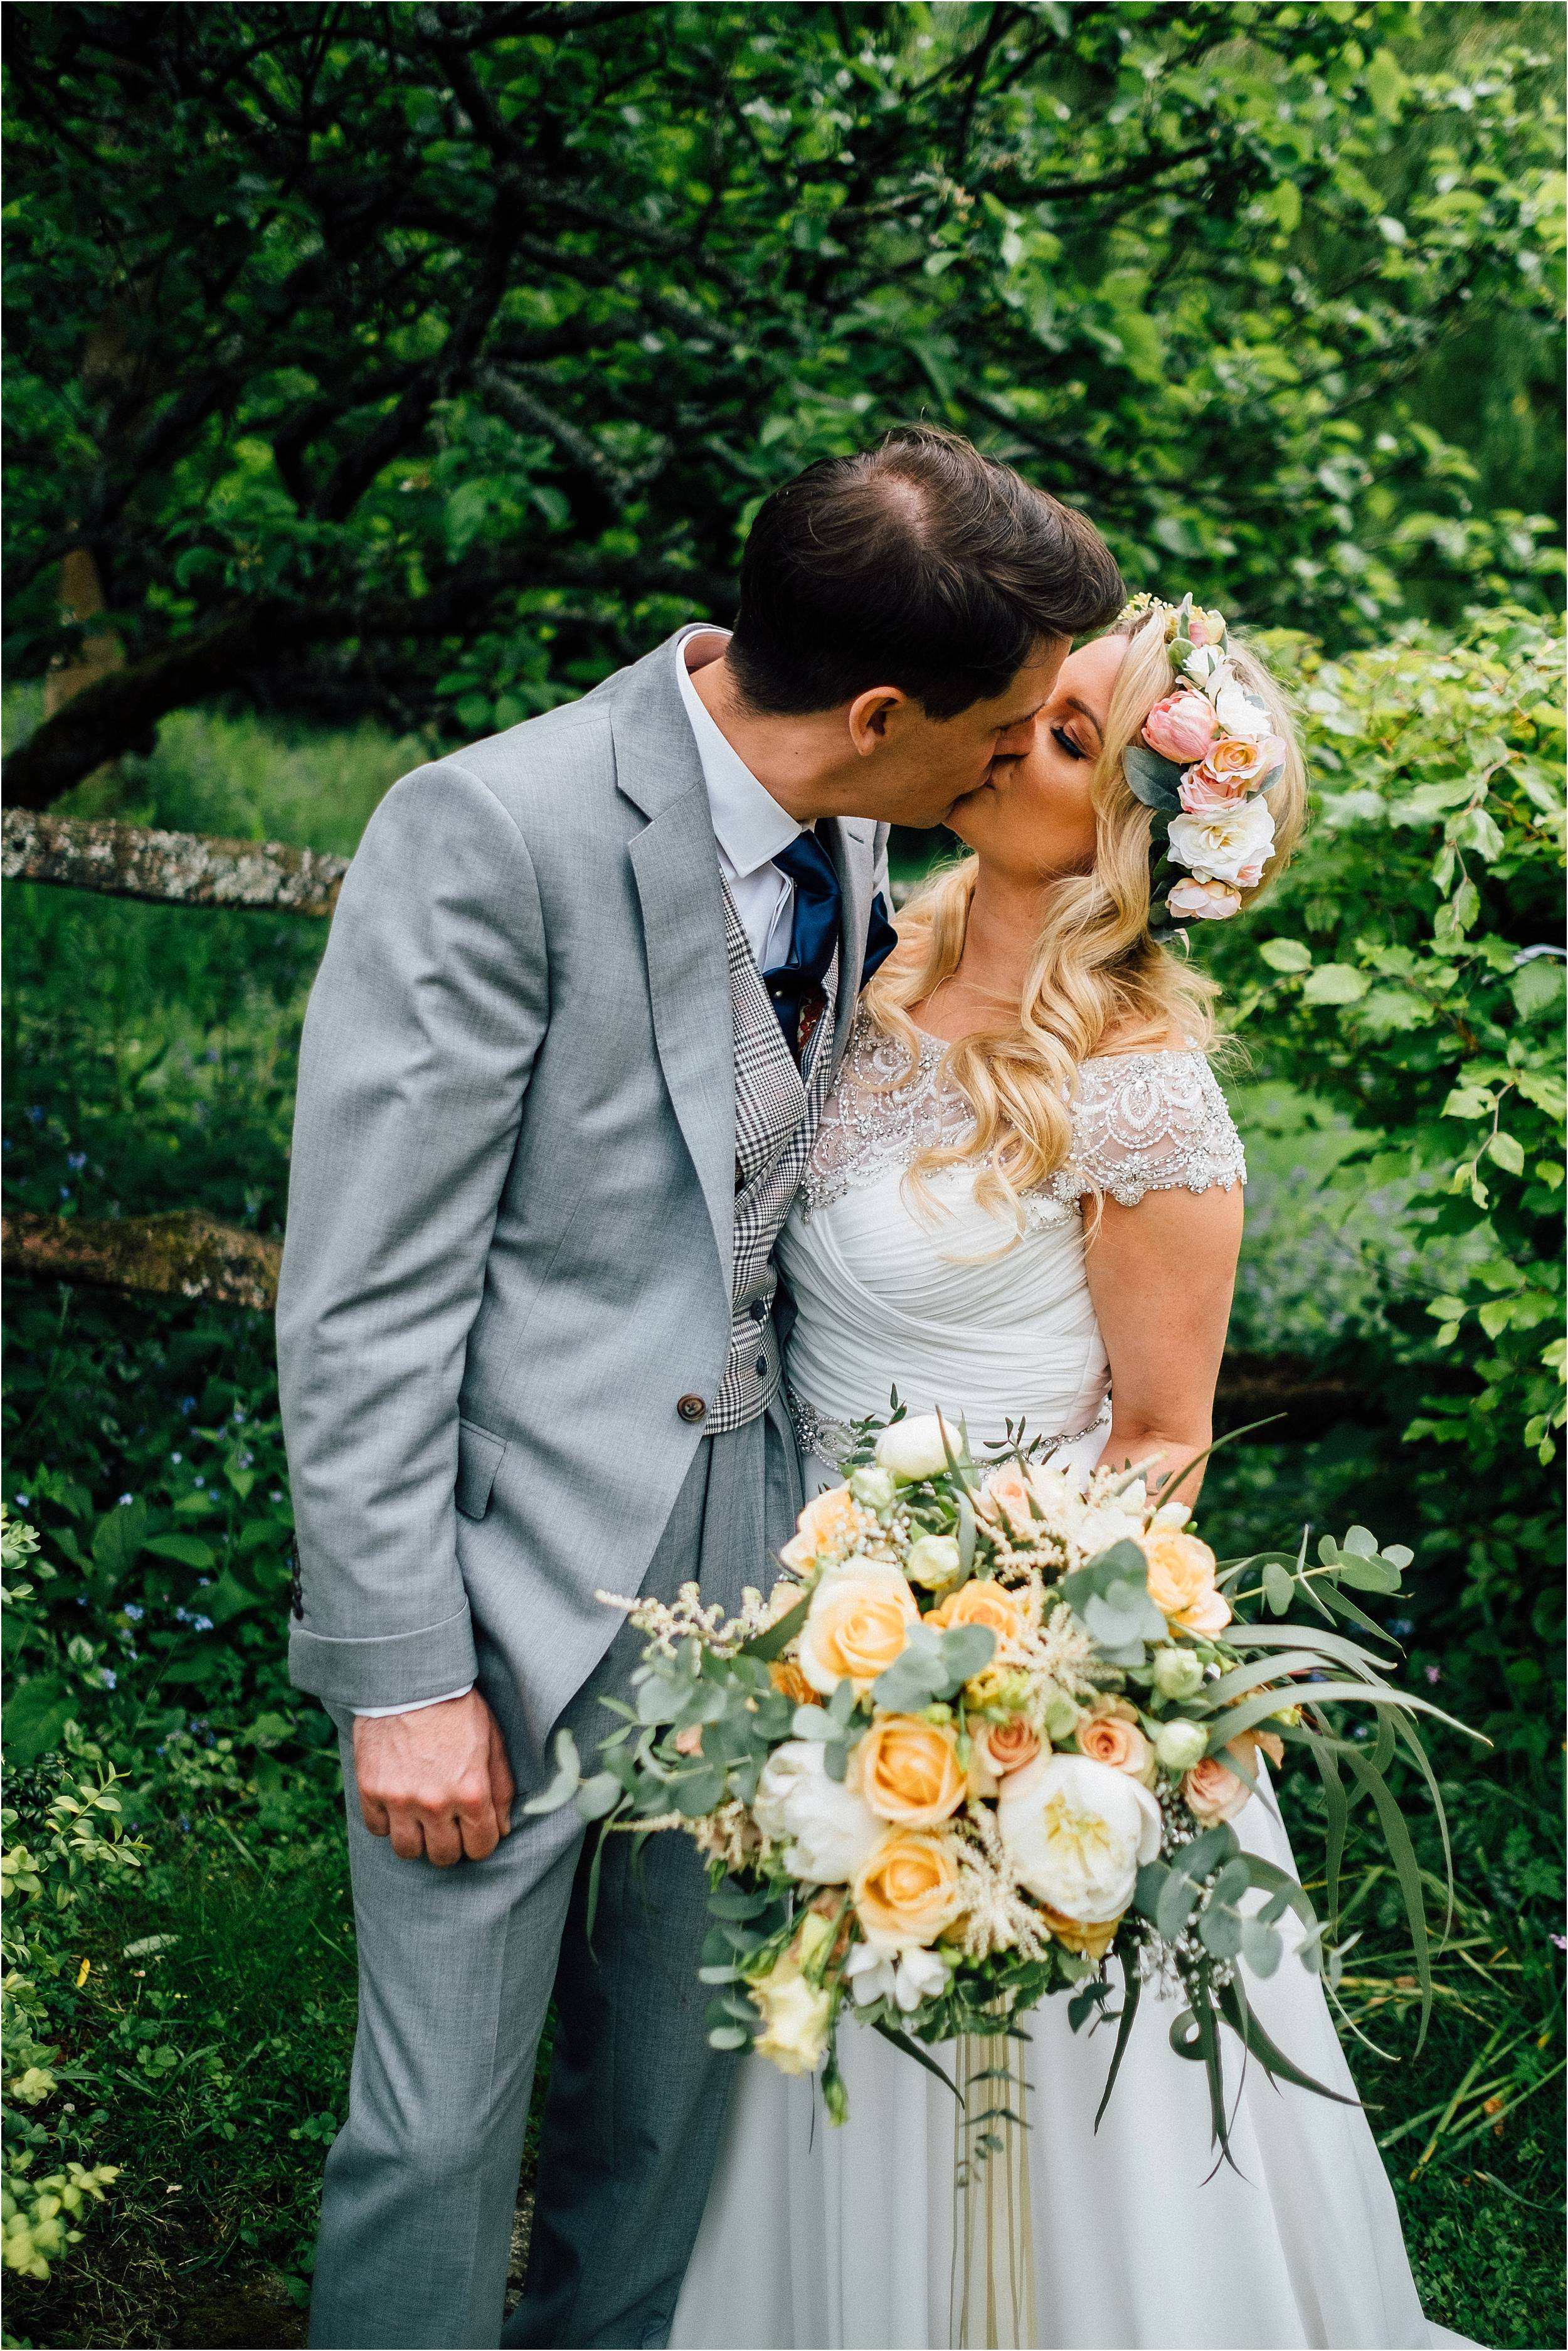 Surrey Hookhouse Farm Wedding Photographer_0095.jpg